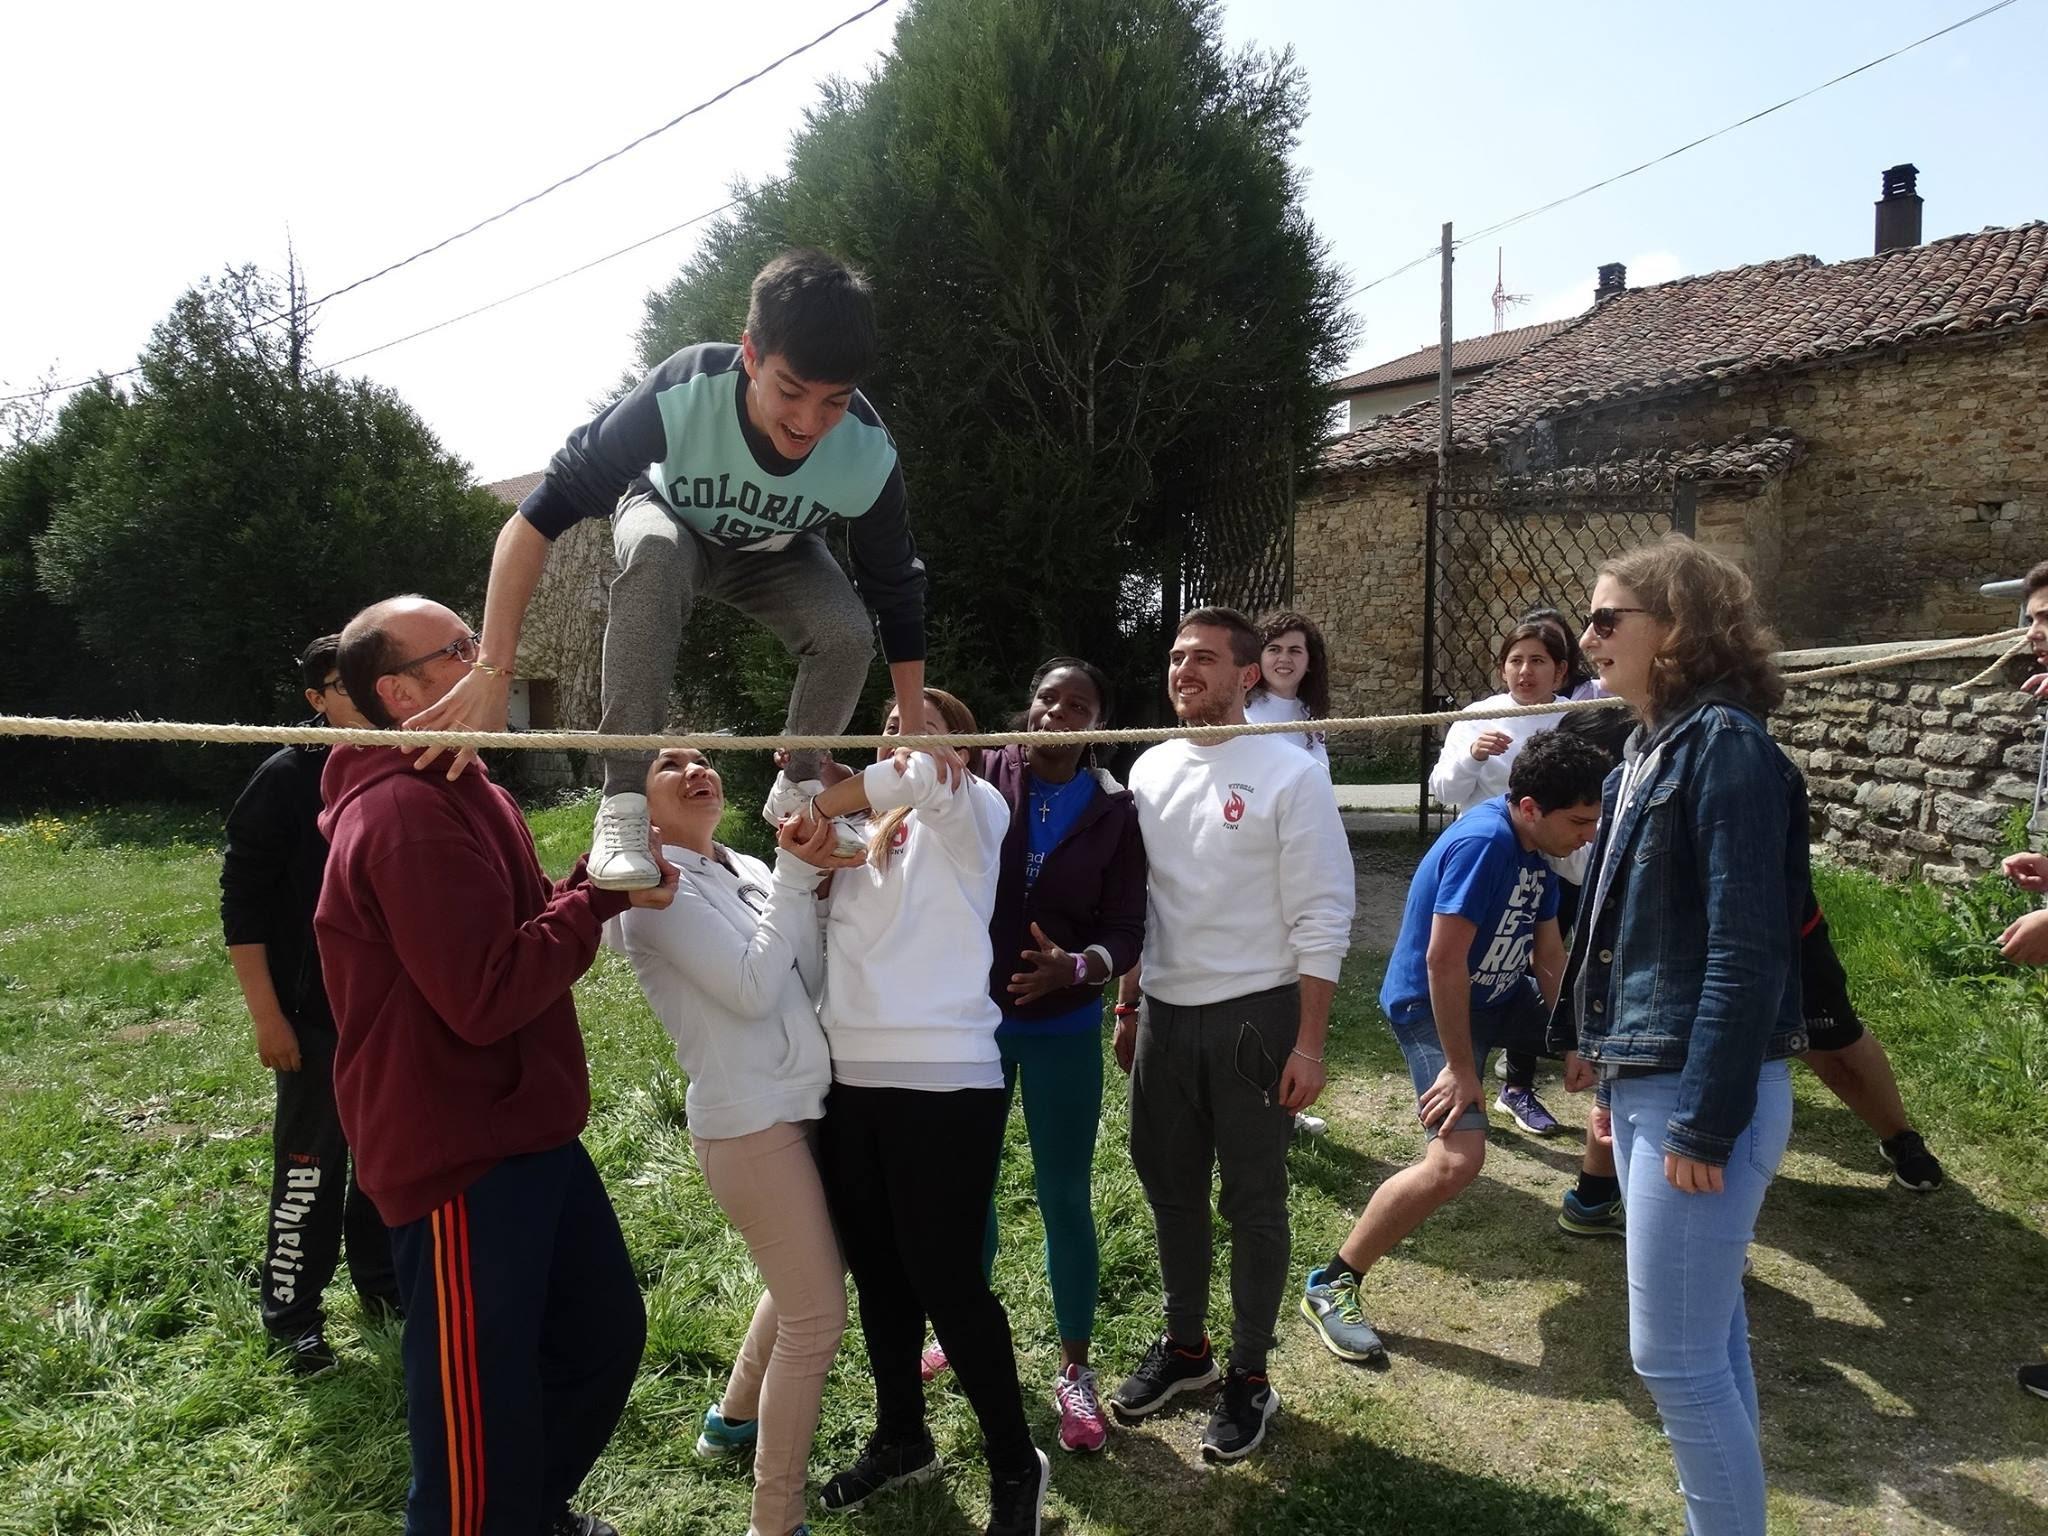 2017.04.13-16 - Pascua Jovenes SdJ (78)